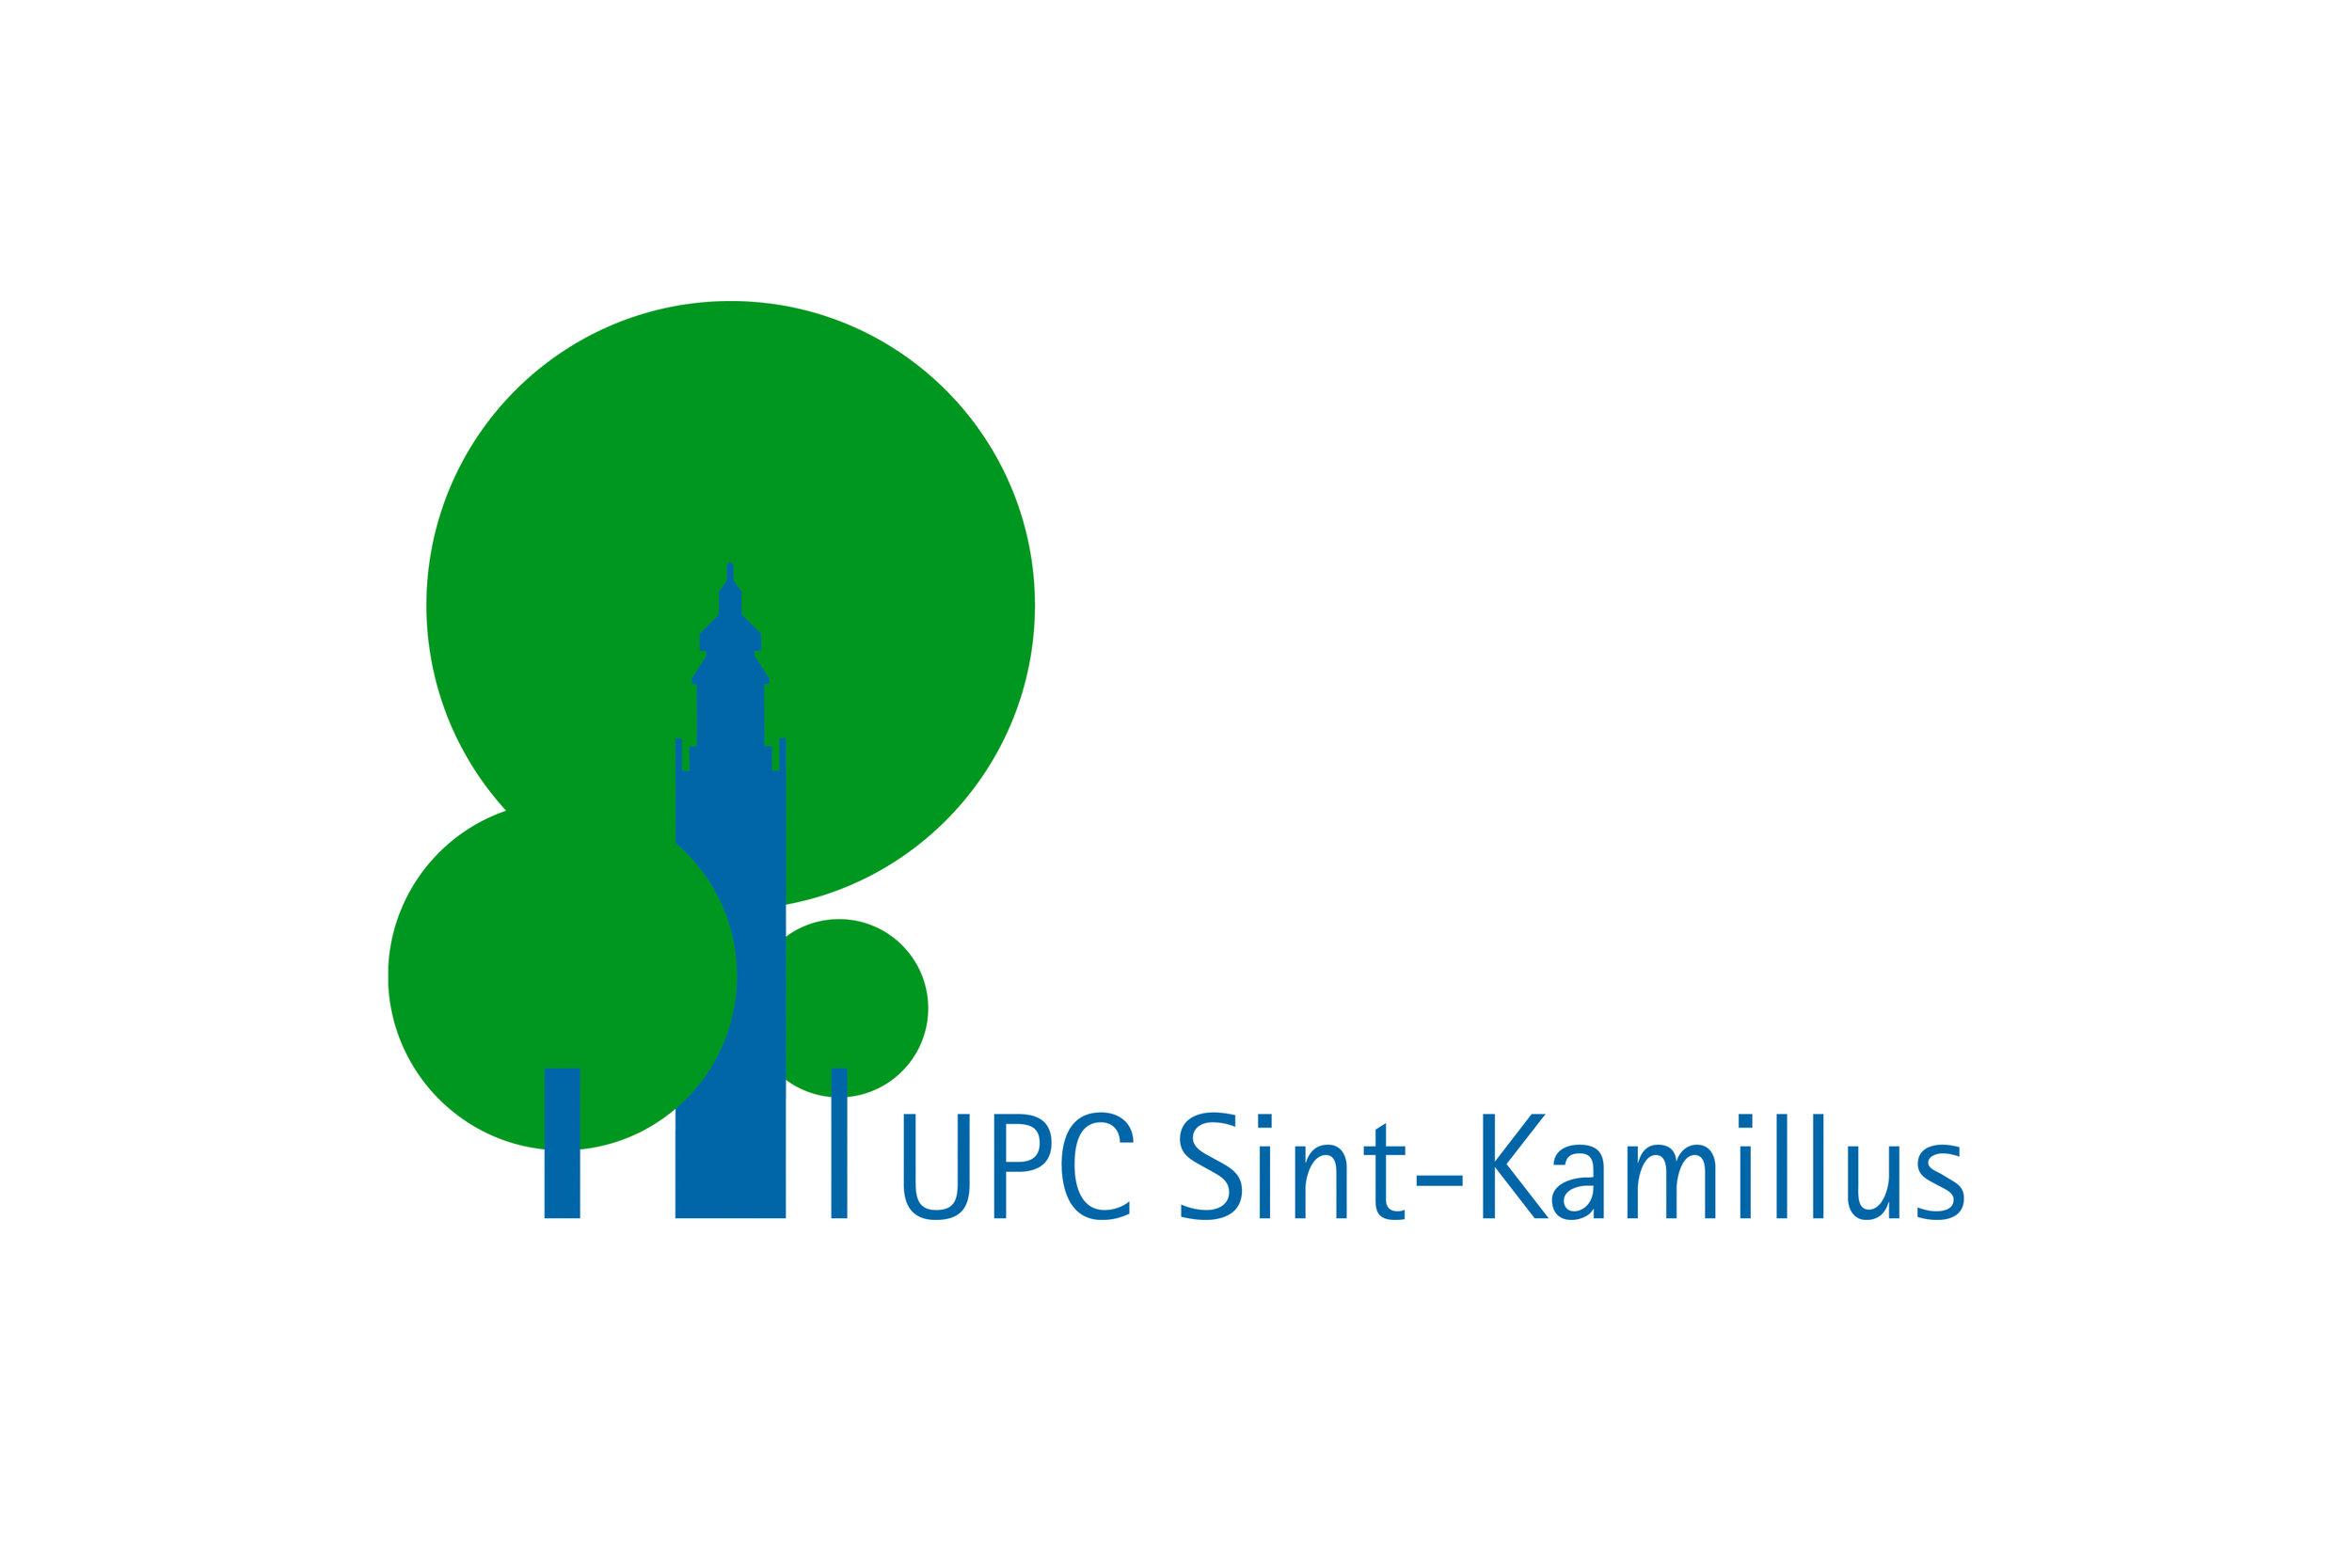 UPC Sint-Kamillus